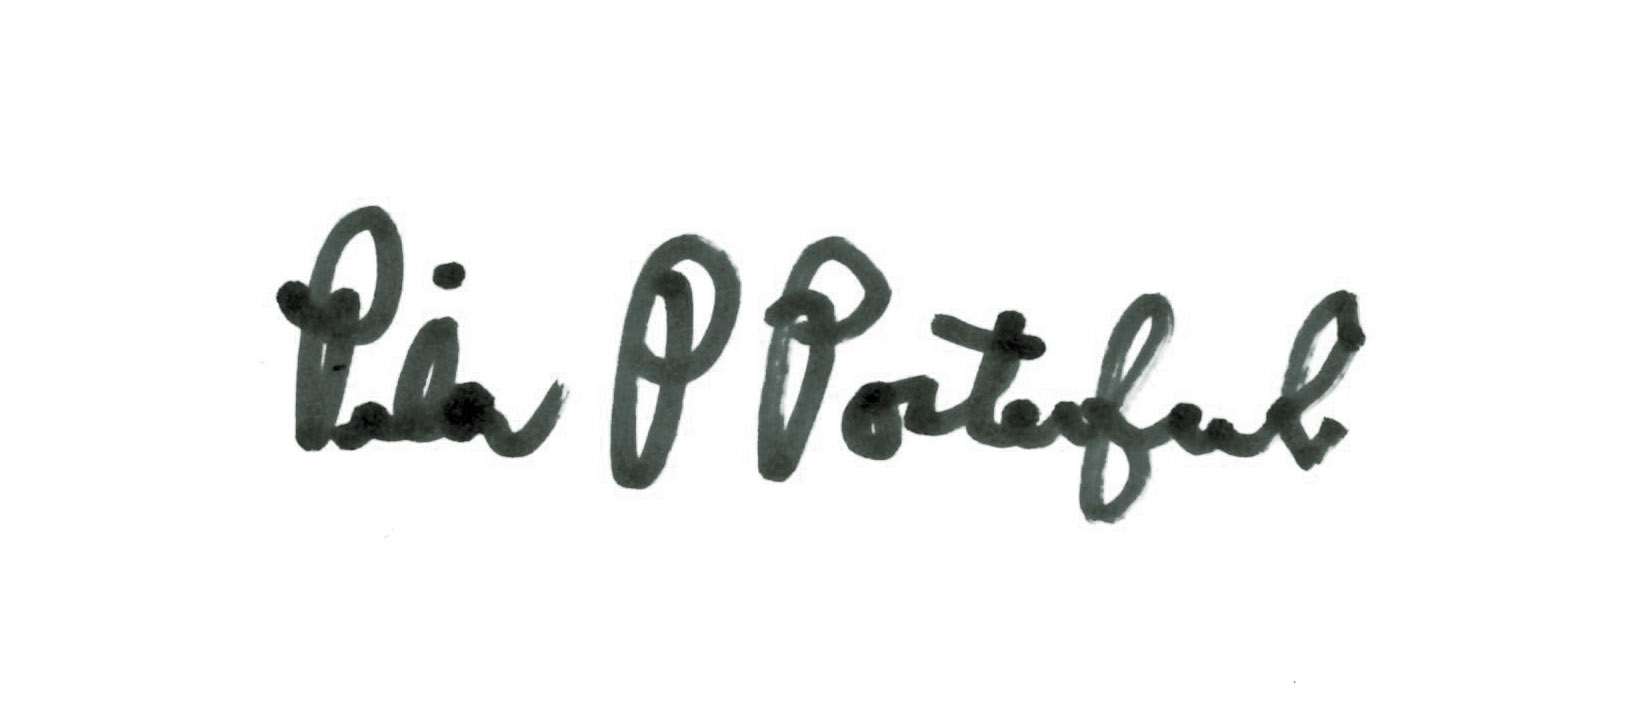 Pilar Porterfield's Signature